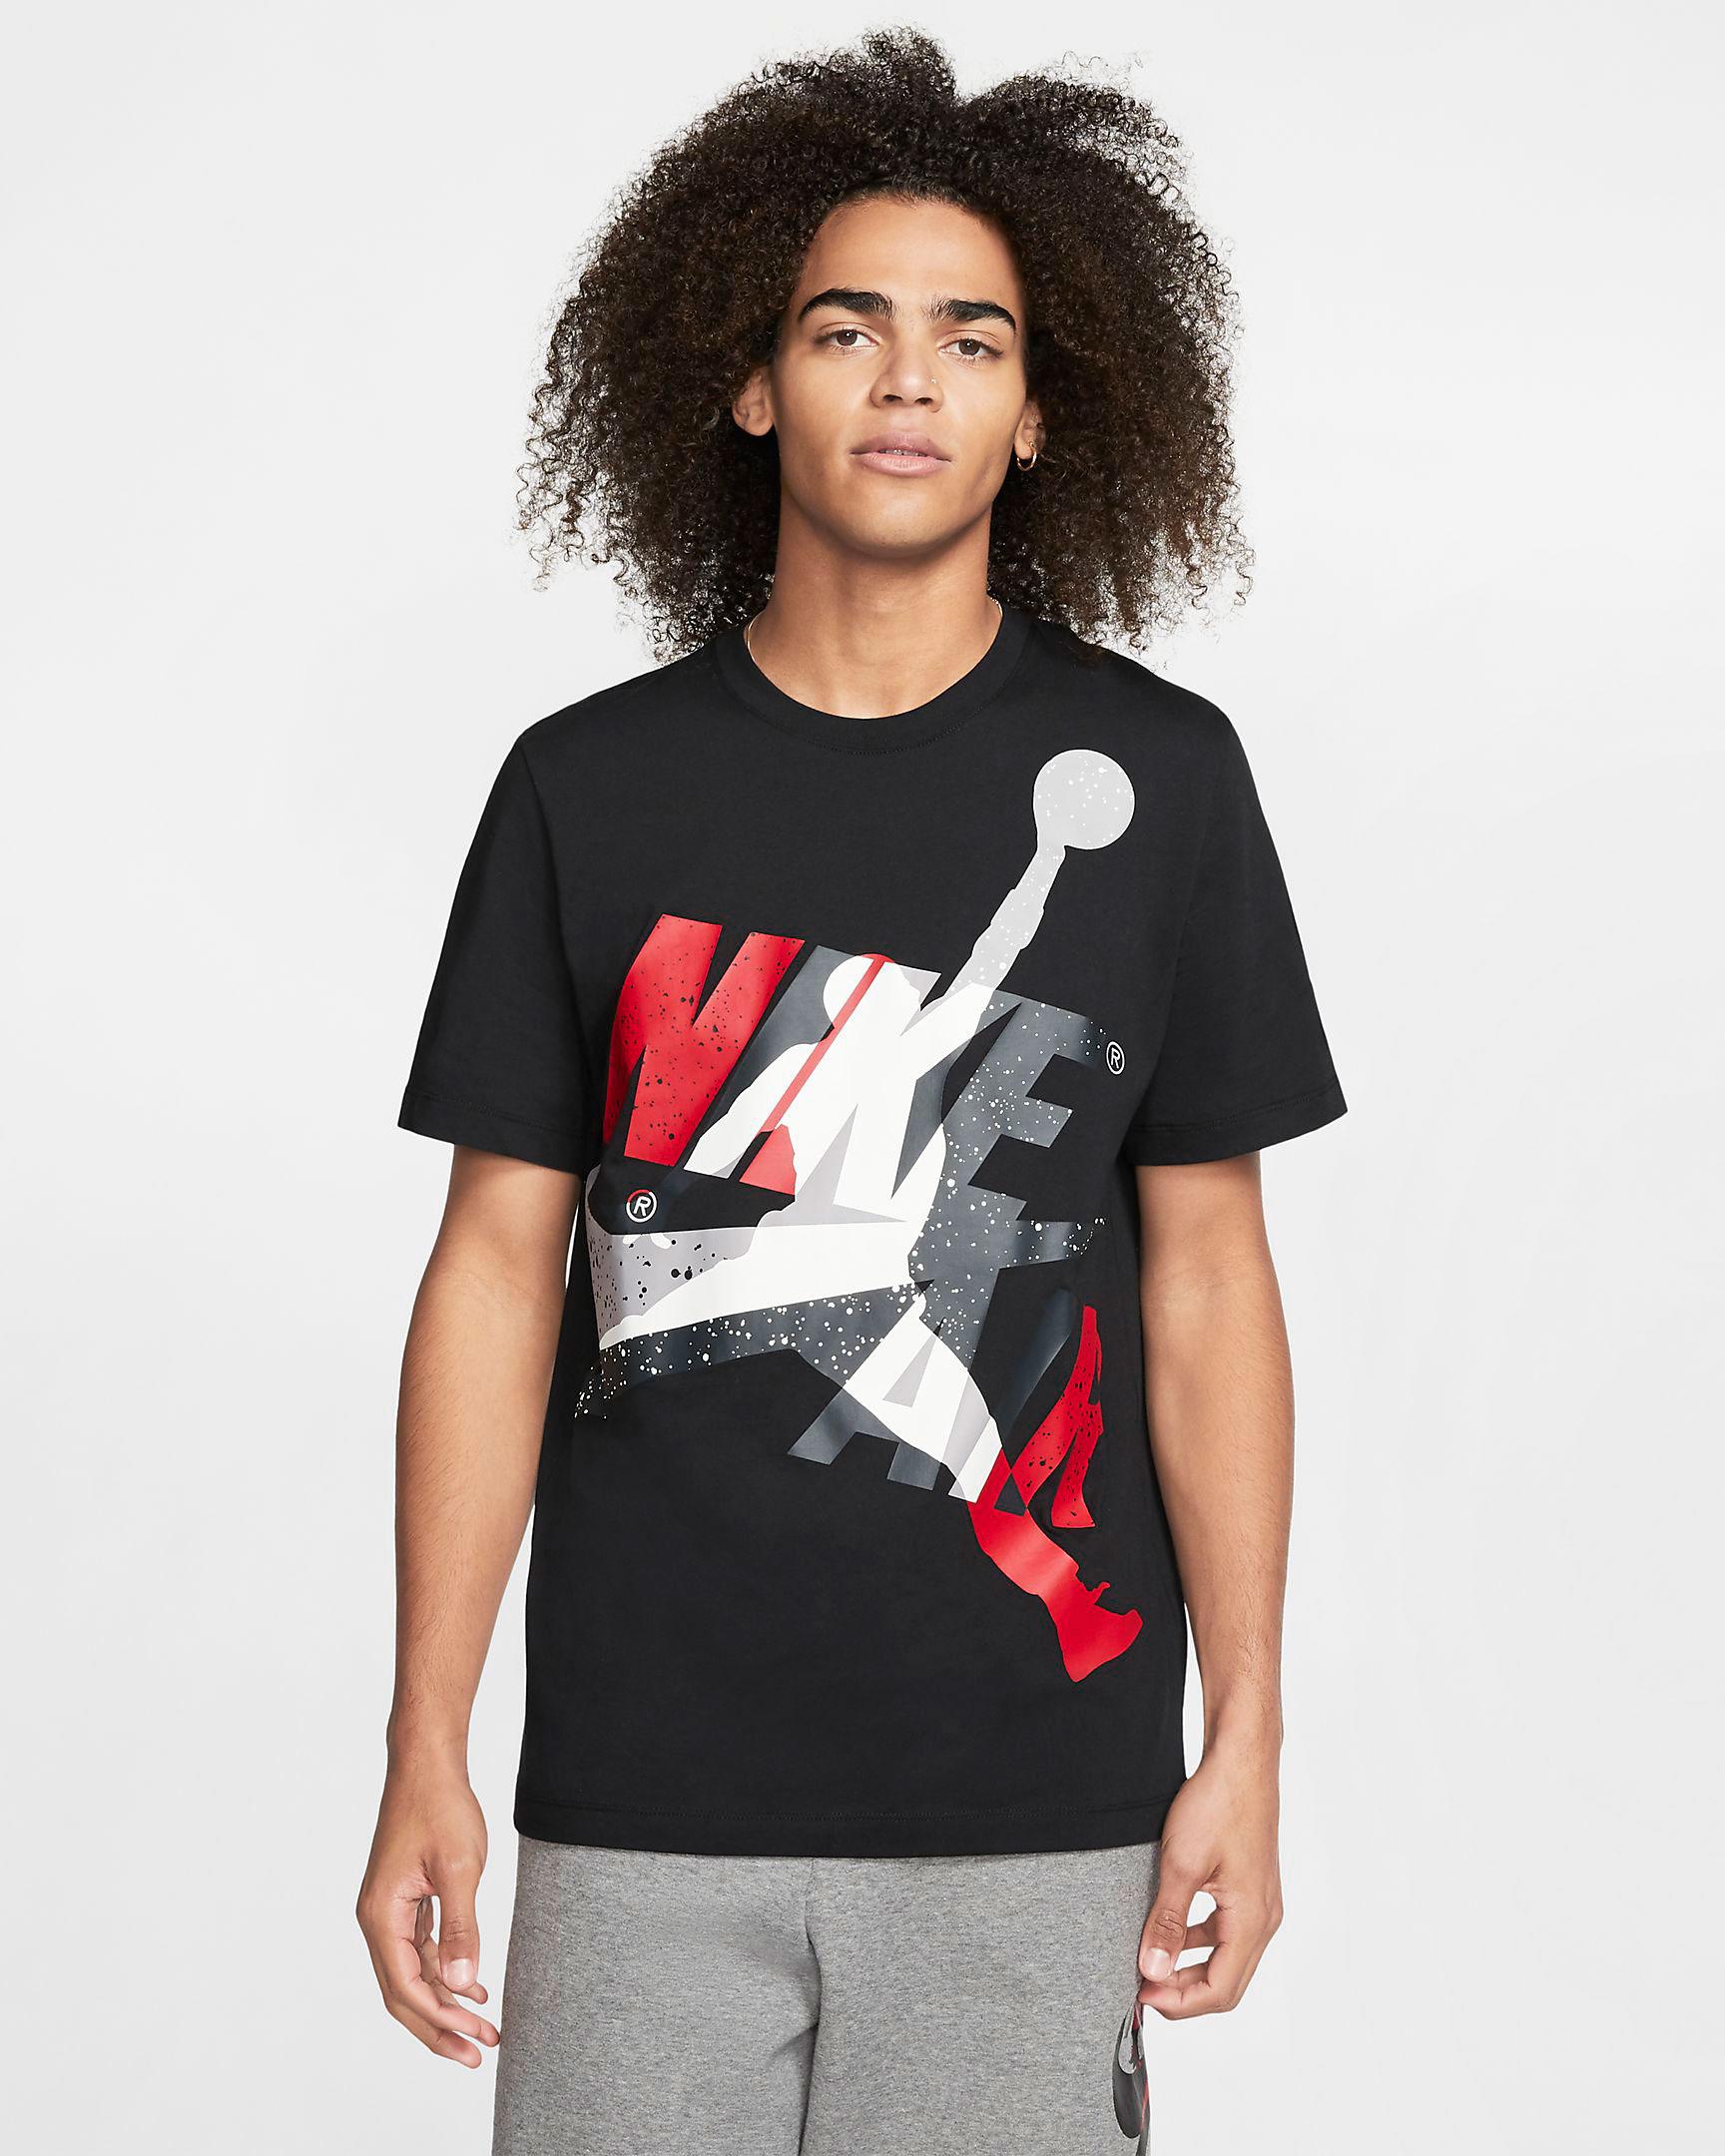 jordan-jumpman-classics-bred-black-red-tee-shirt